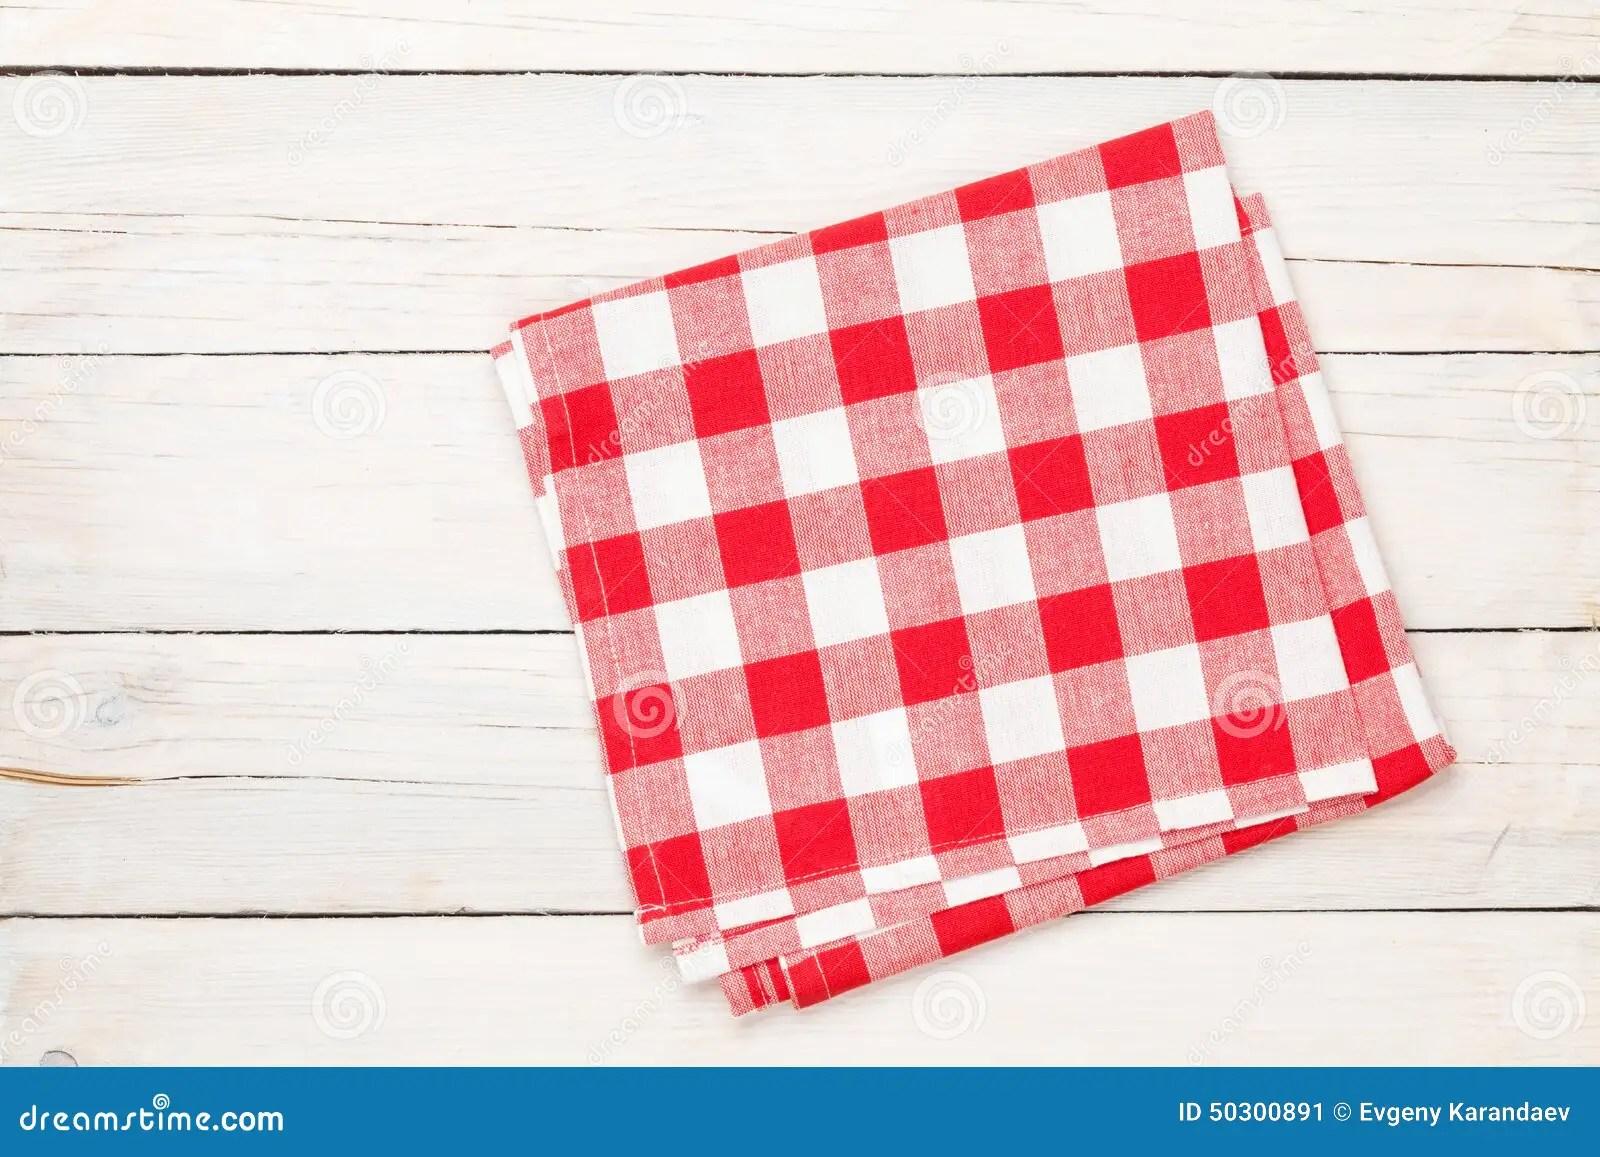 towel for kitchen aid oven 在木厨房用桌的红色毛巾库存图片 图片包括有干净 检查 菜单 餐馆 在木厨房用桌的红色毛巾